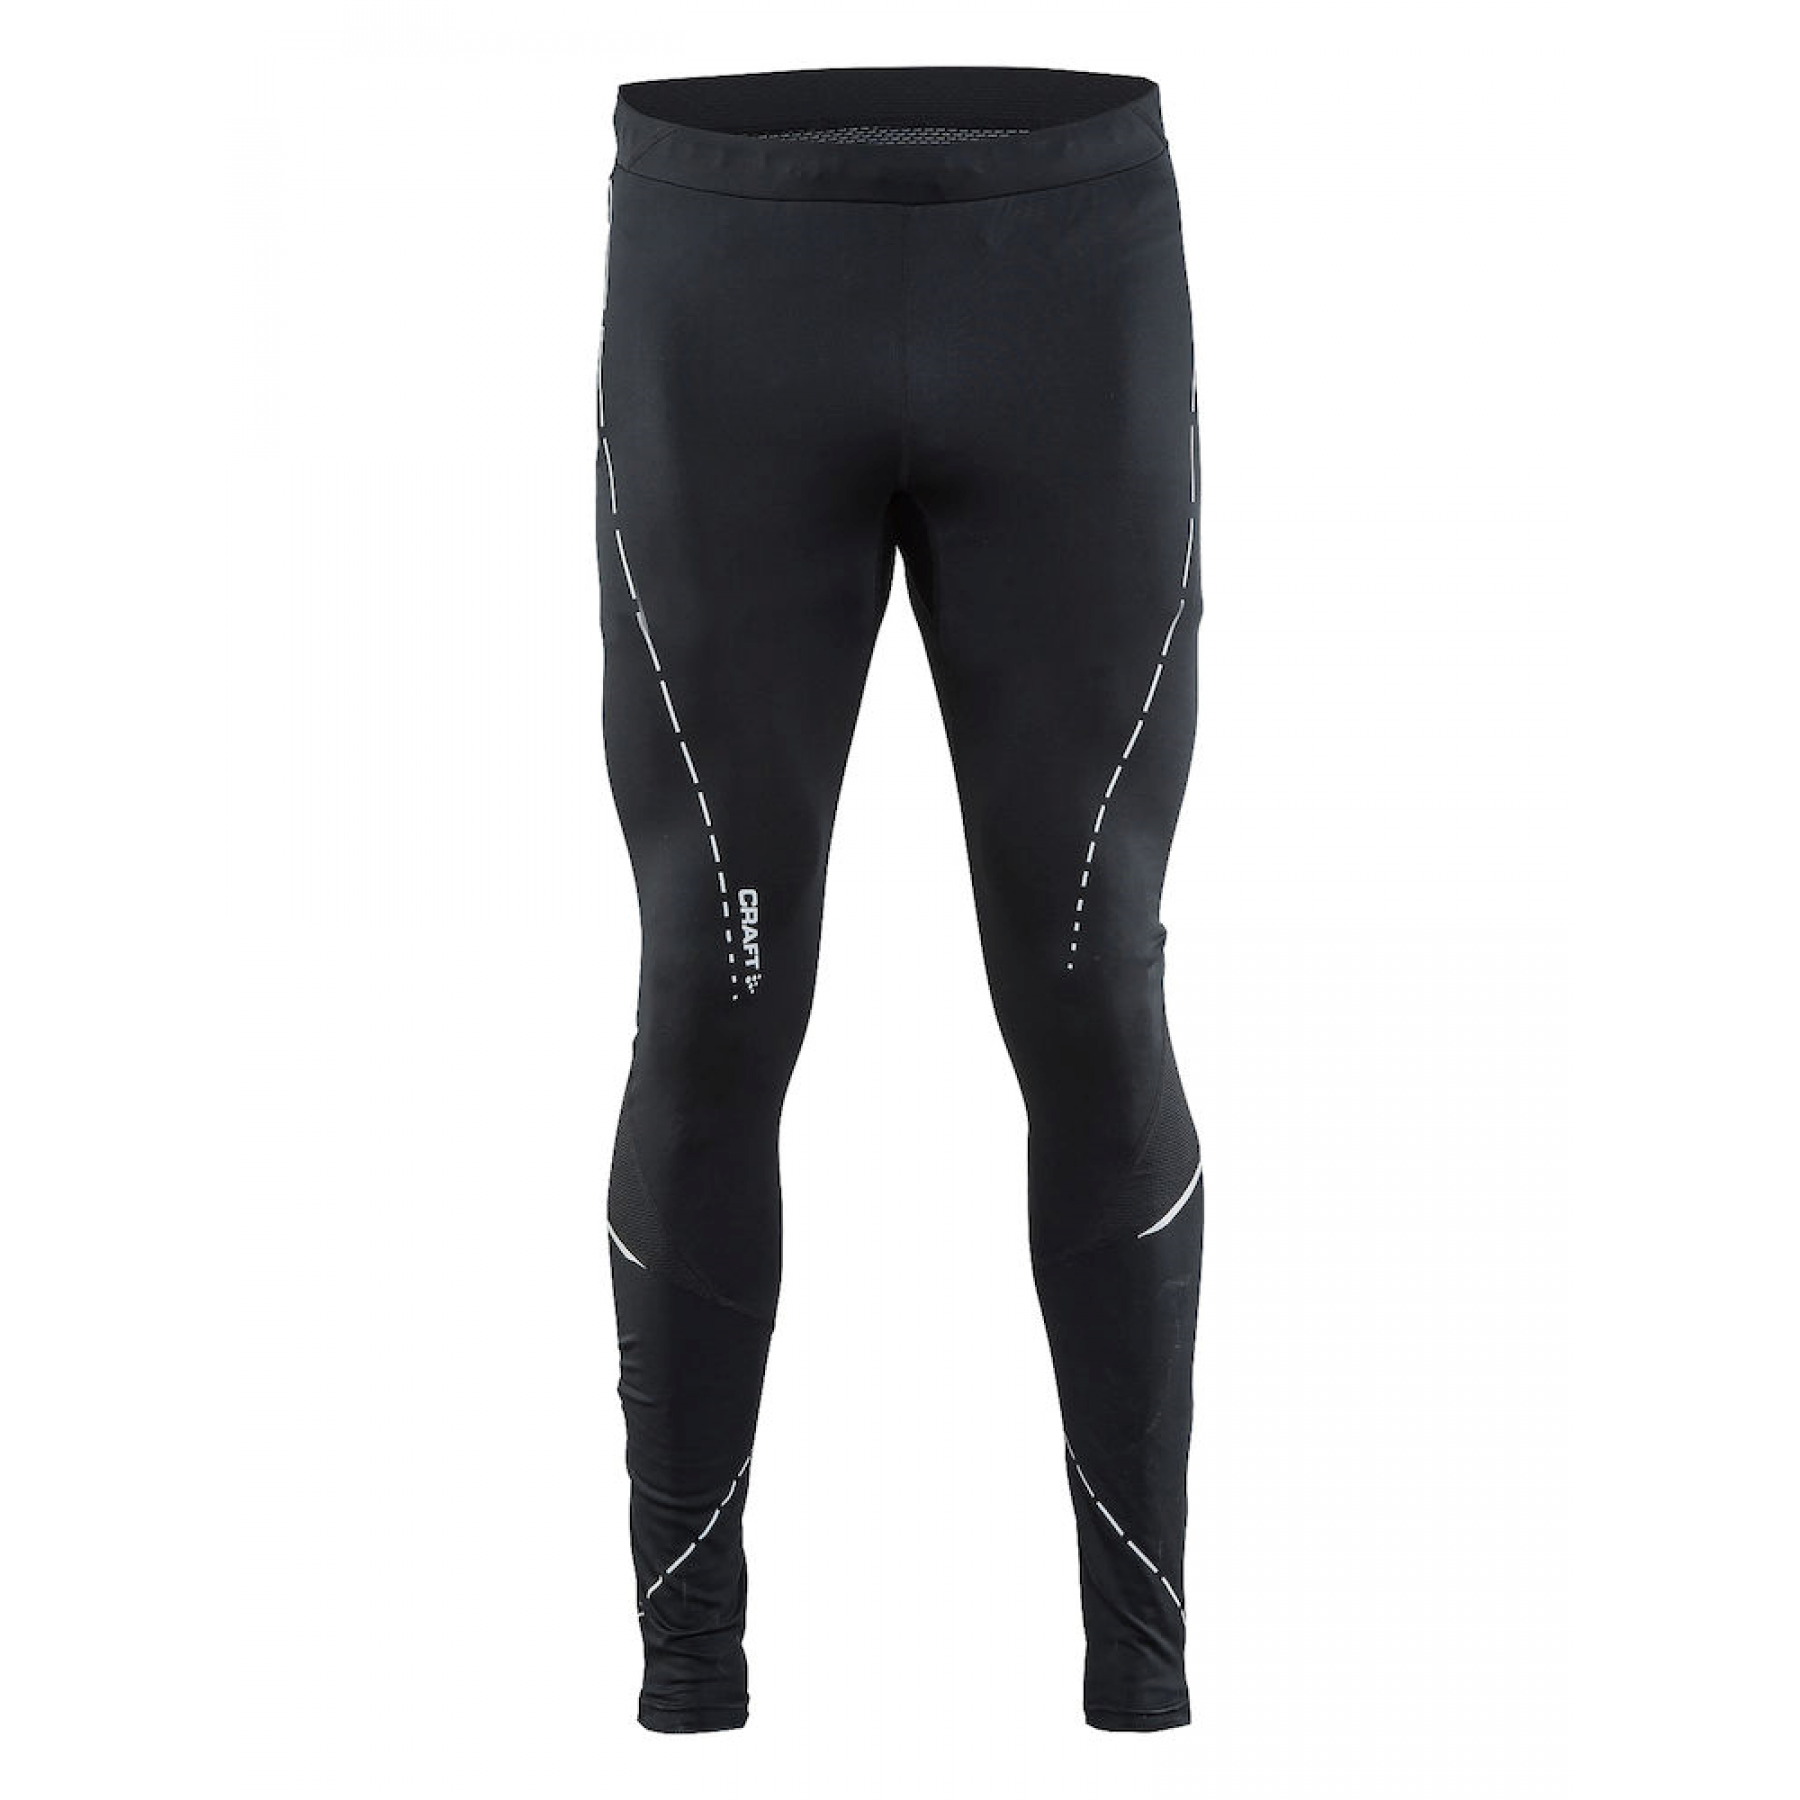 3eb00d59 Craft Essential Tights Men's Black | Supersport.no